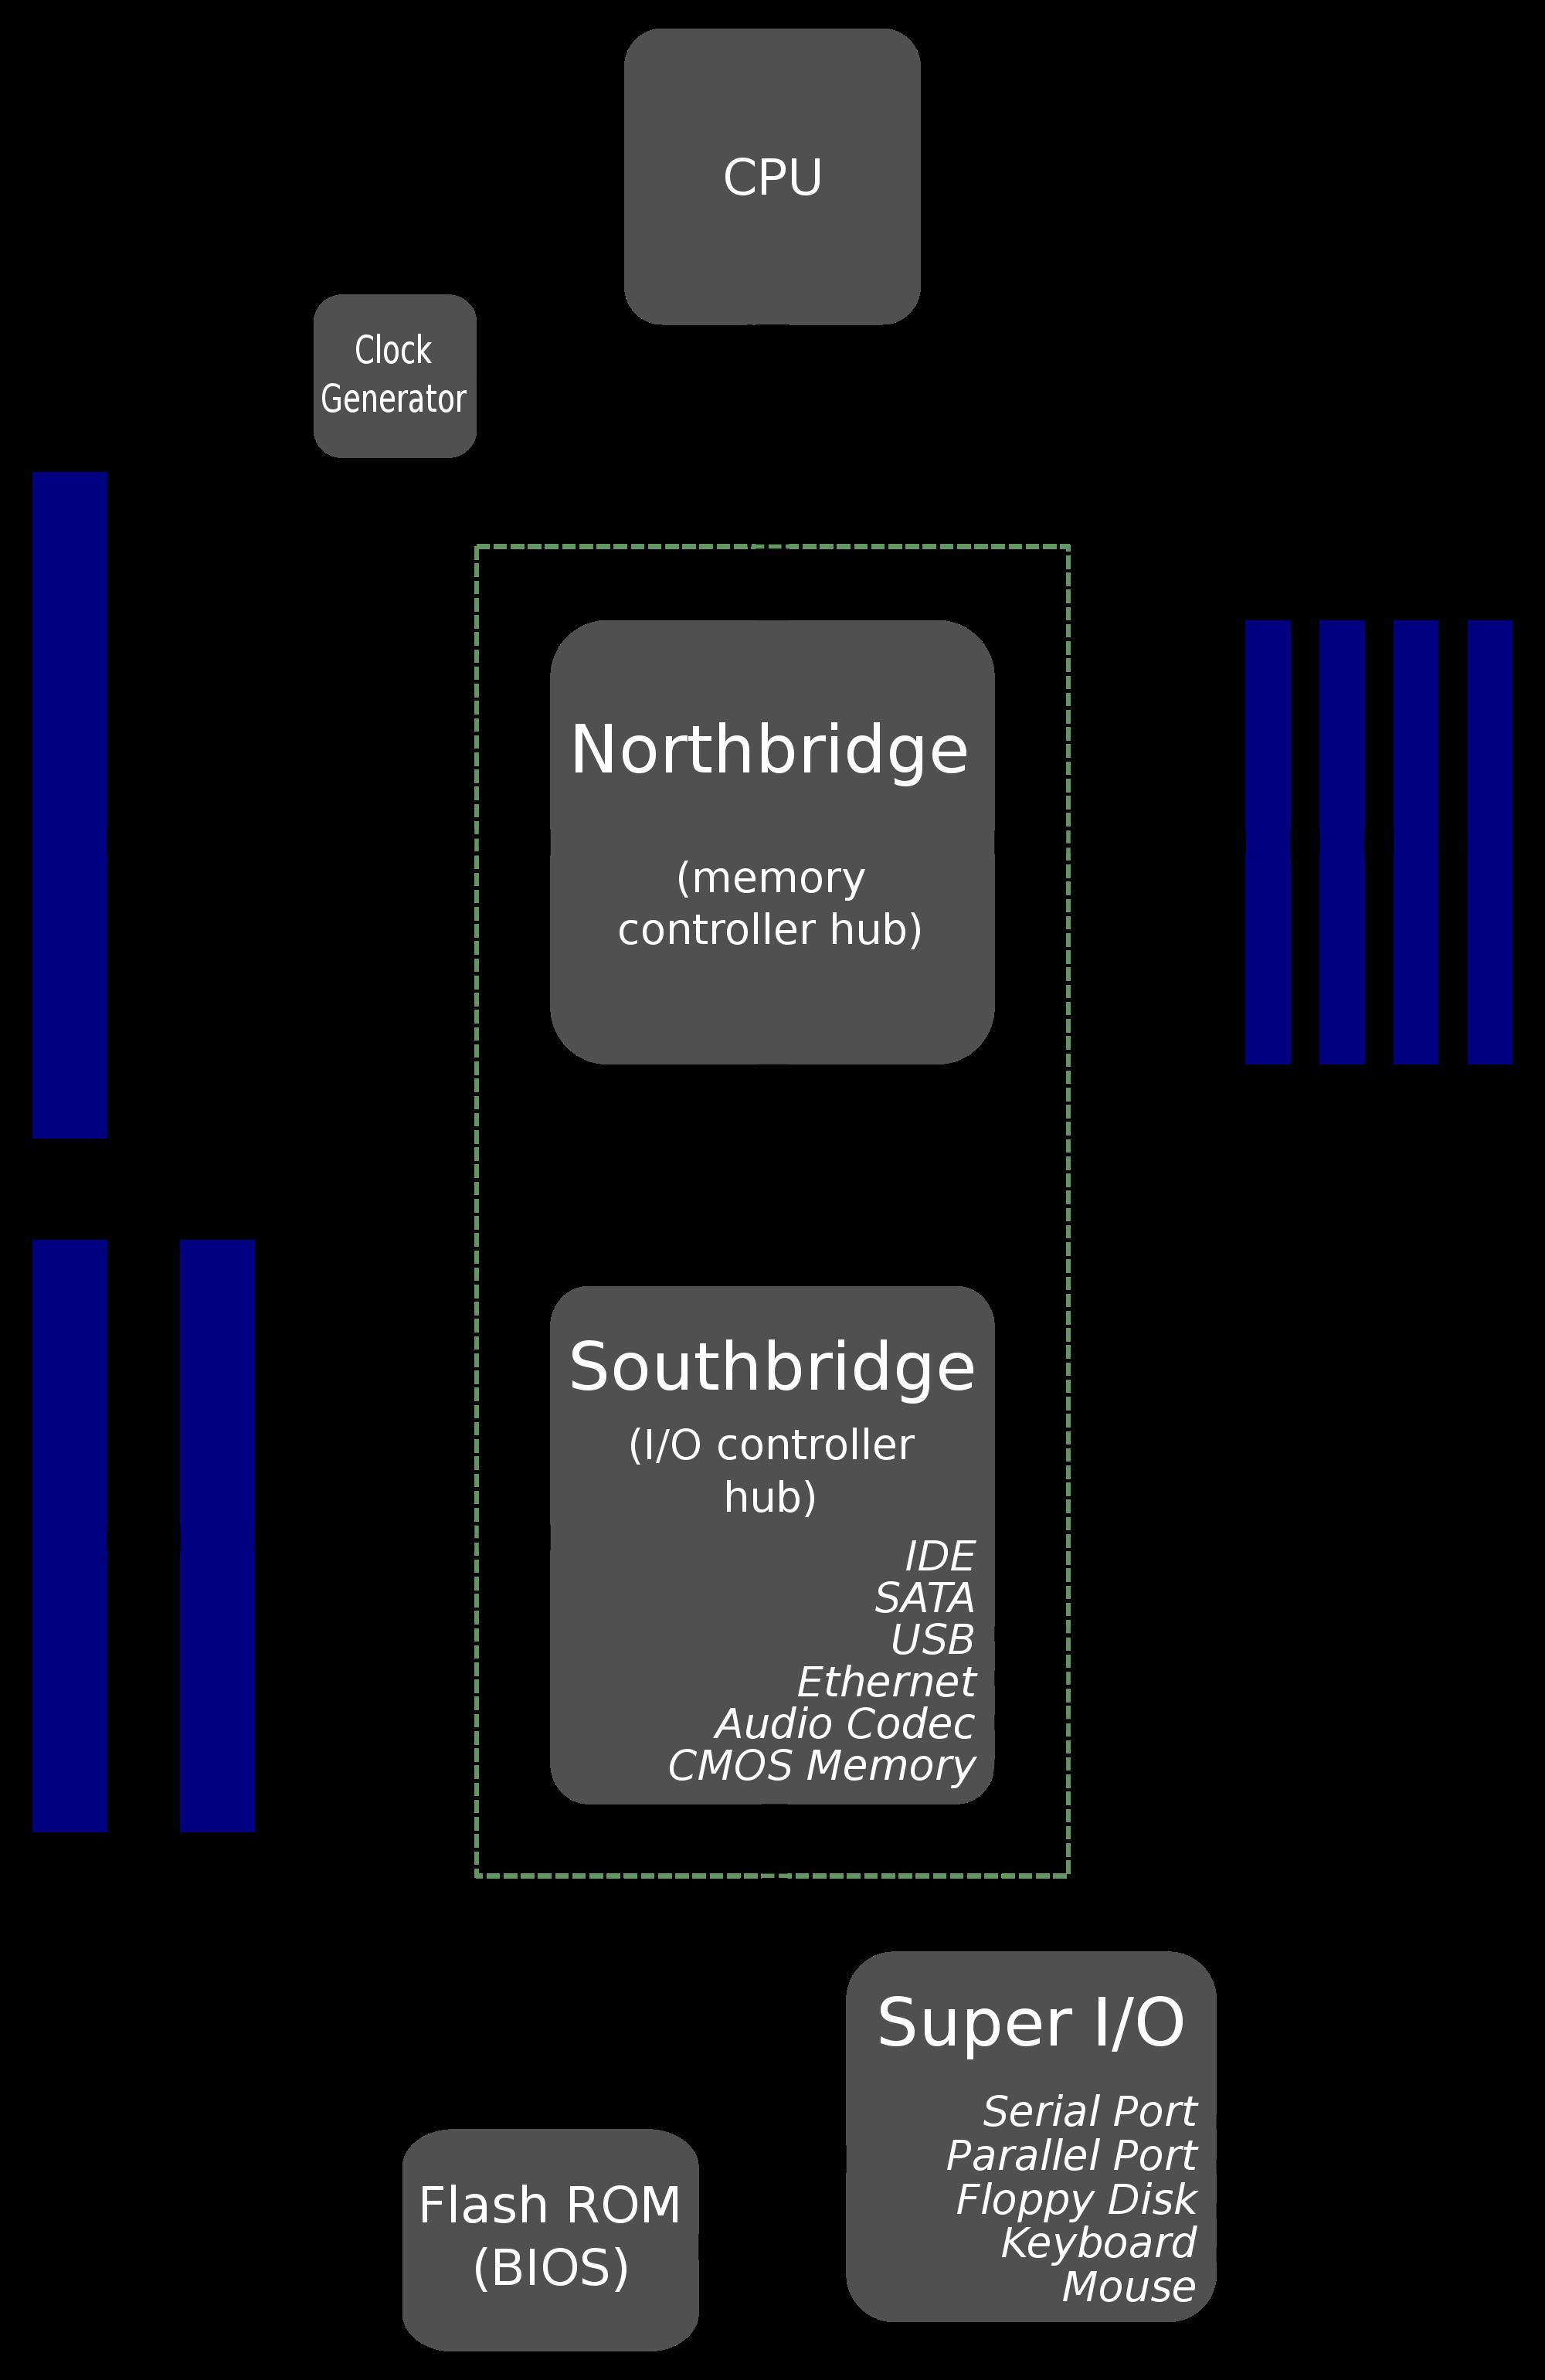 Dorable Transistor Bc557 Wikipedia Photos - Electrical Diagram Ideas ...